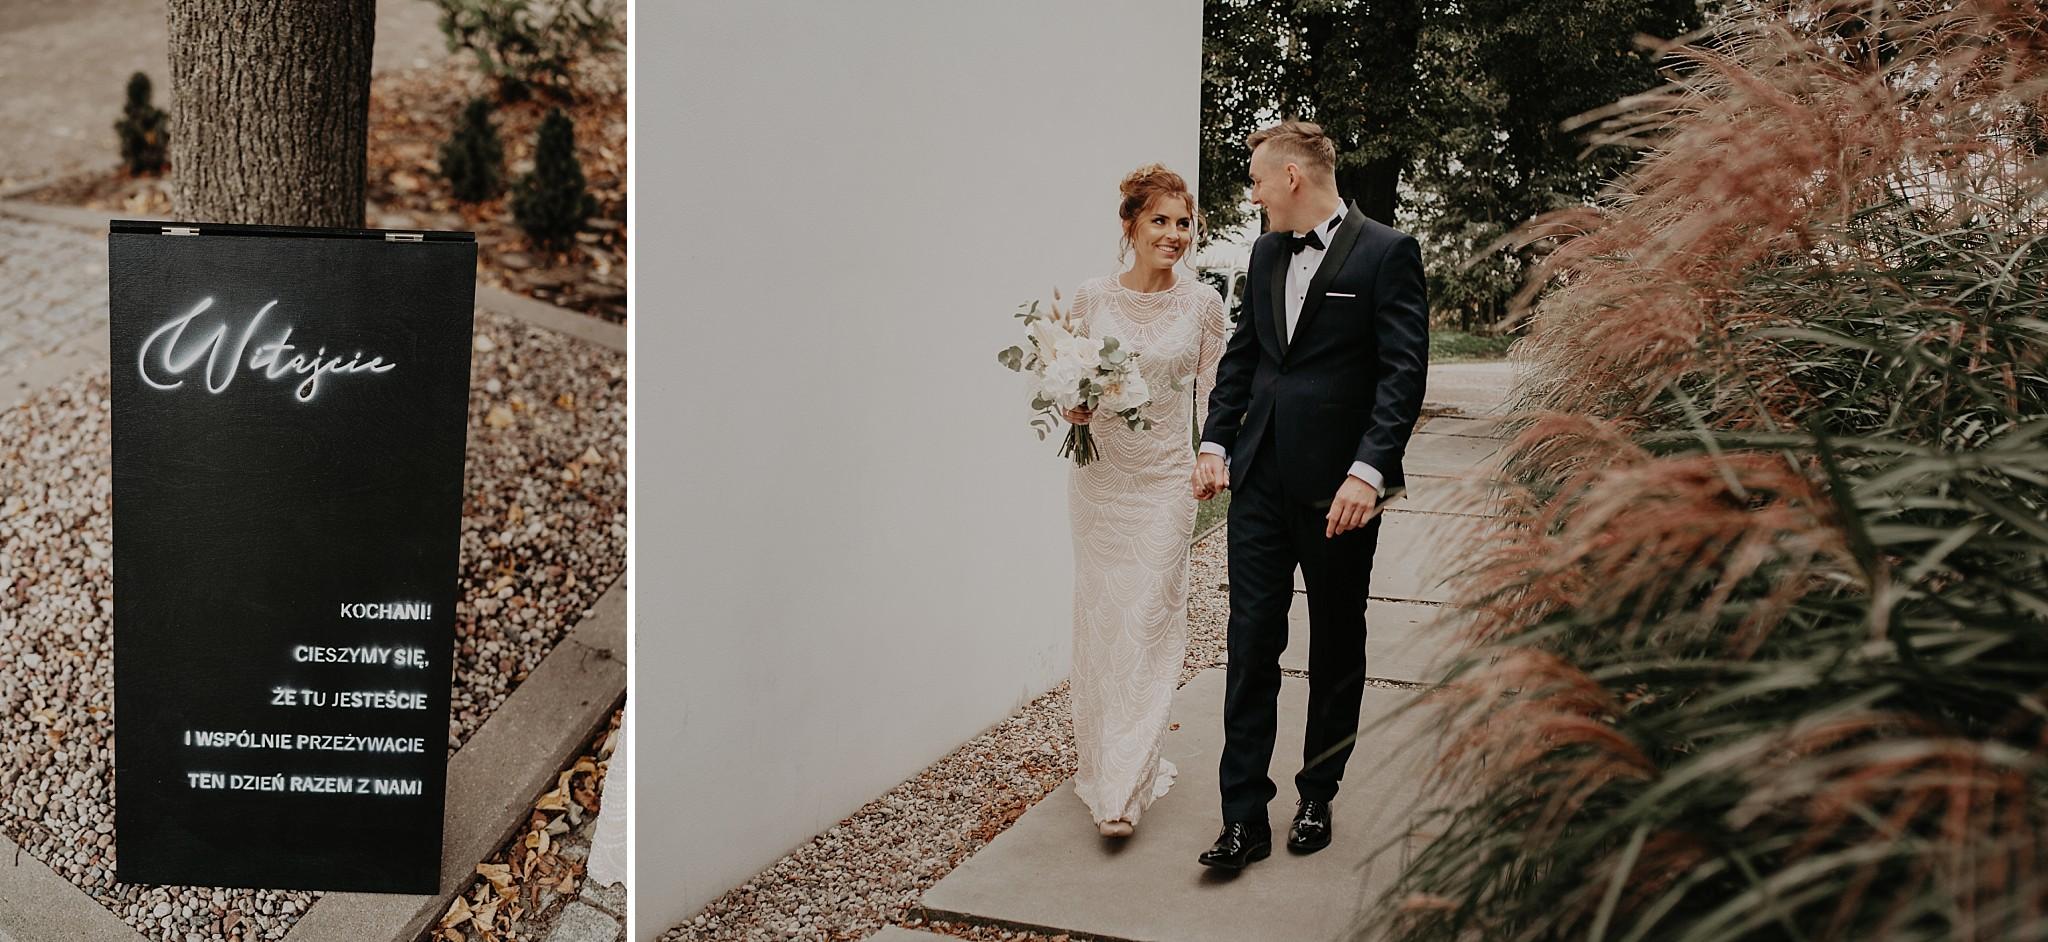 fotograf poznan wesele dobra truskawka piekne wesele pod poznaniem wesele w dobrej truskawce piekna para mloda slub marzen slub koronawirus slub listopad wesele koronawirus 240